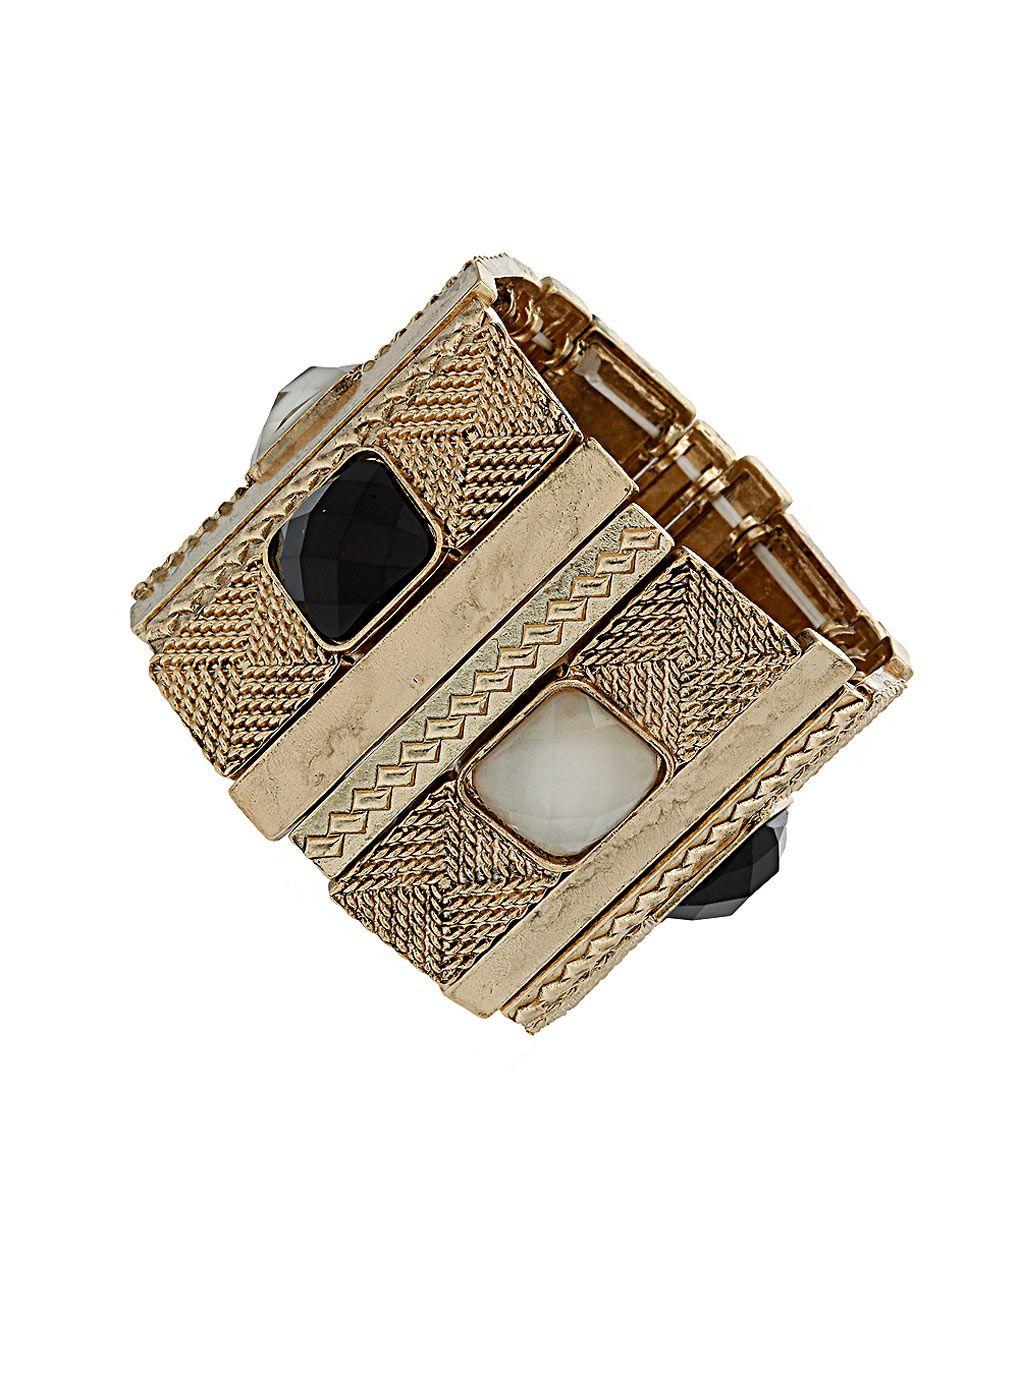 Bracelet with cream and black gems